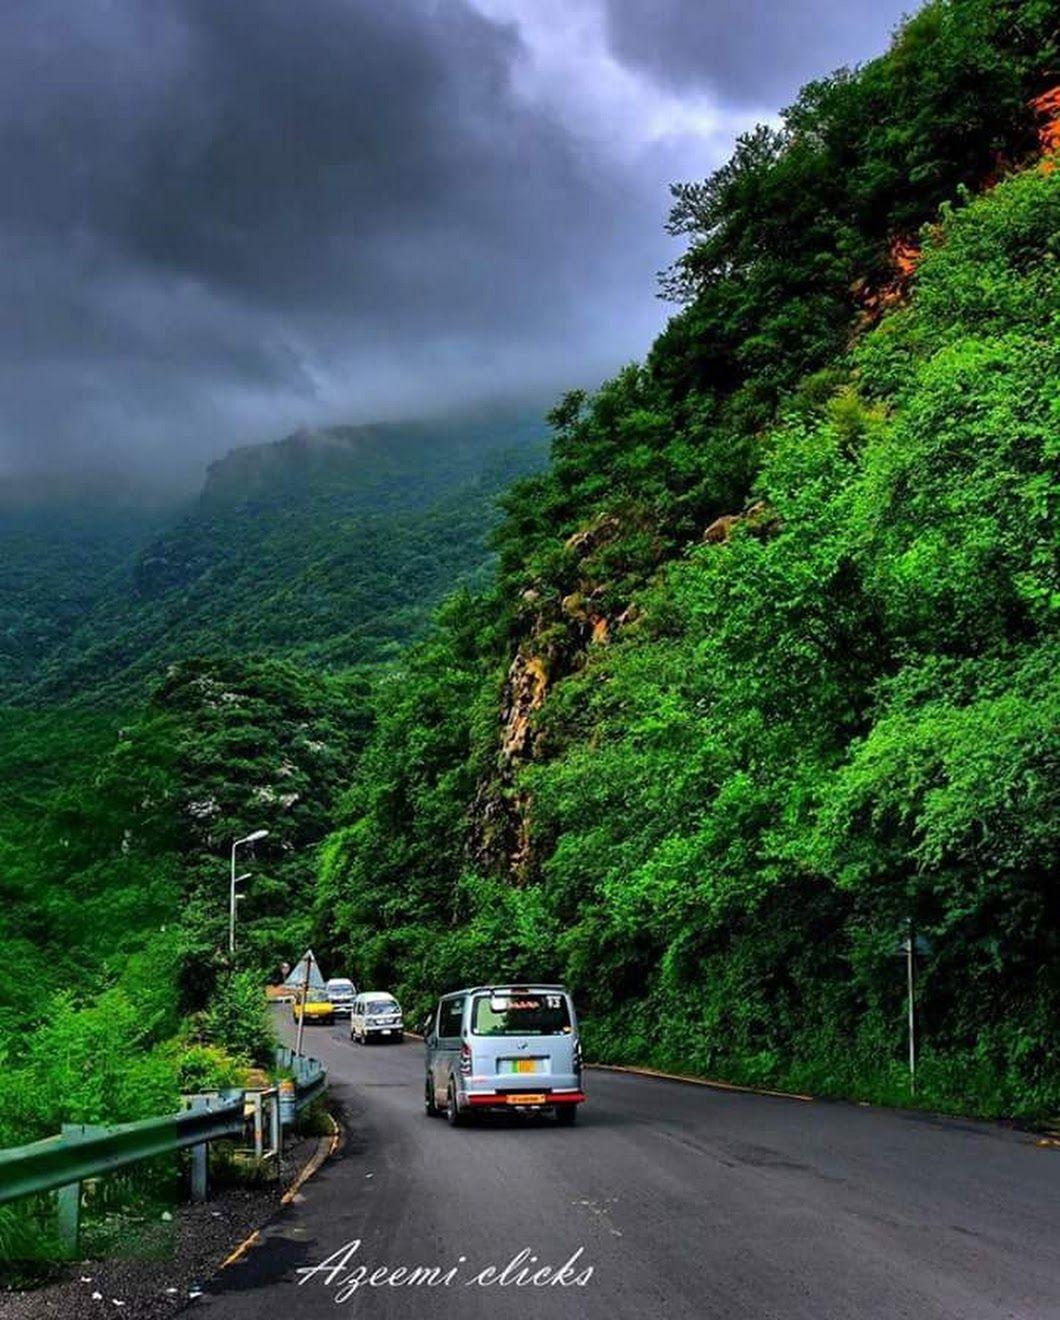 Weather Forecast Islamabad: Margalla Hills, Islamabad Crdits: Azeemi Clicks #margalla